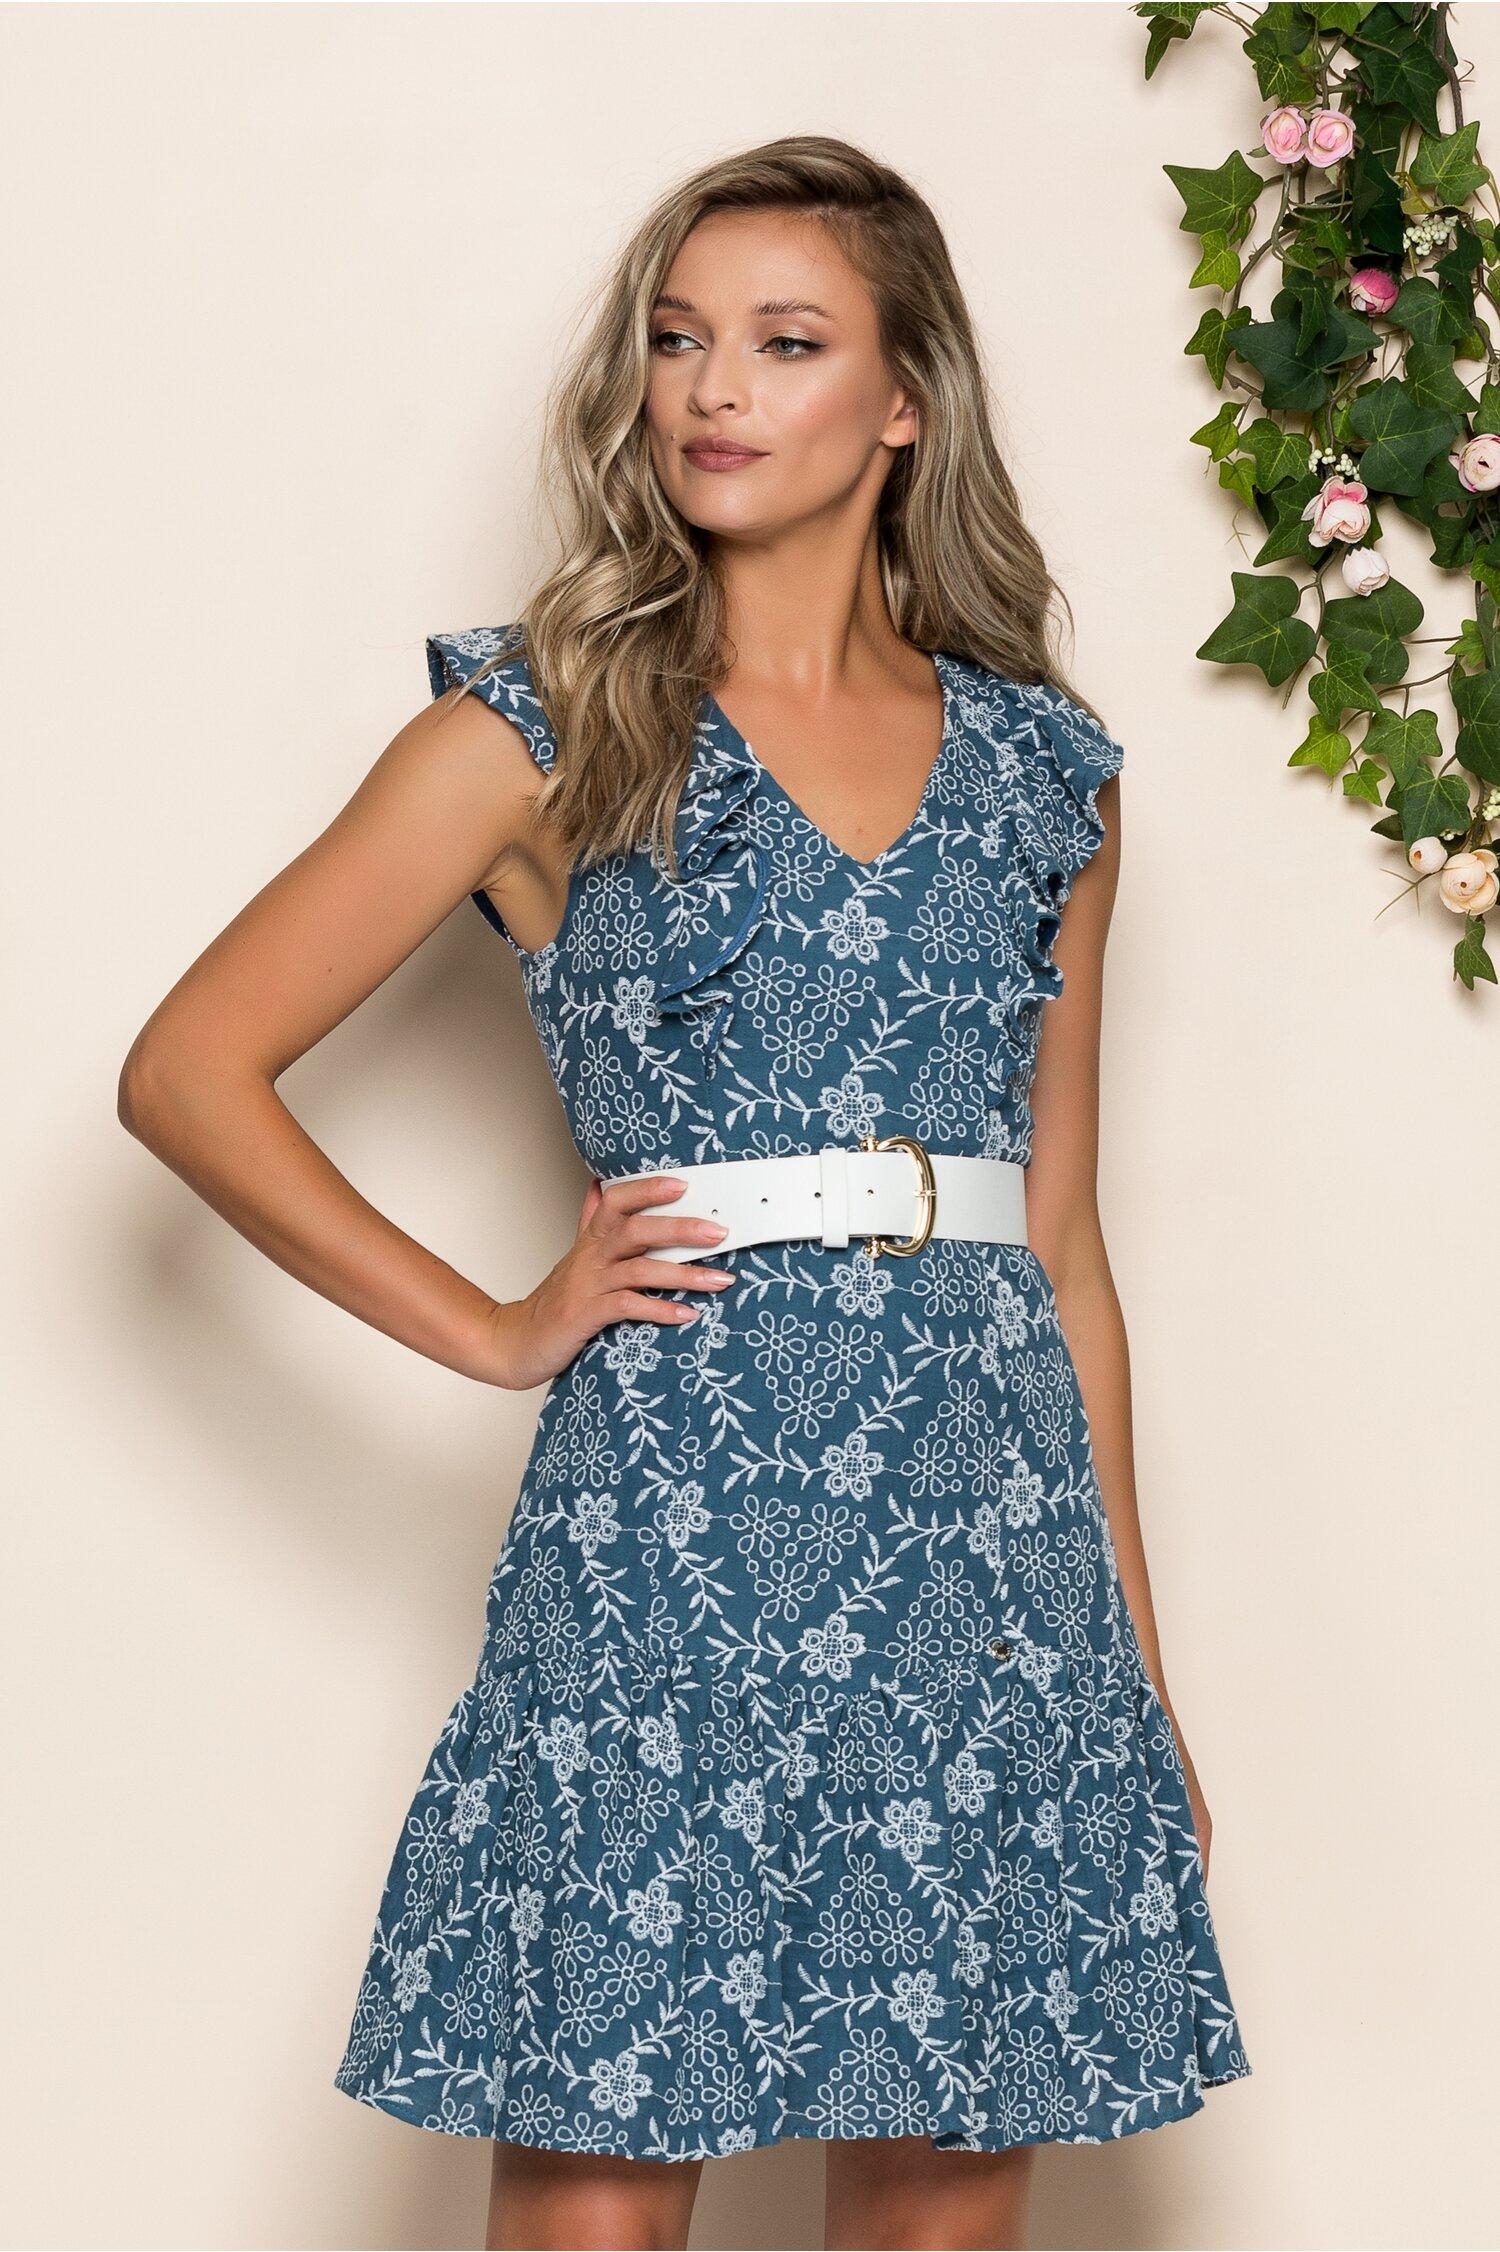 Rochie Mara albastra cu flori albe brodate si volanase la umeri